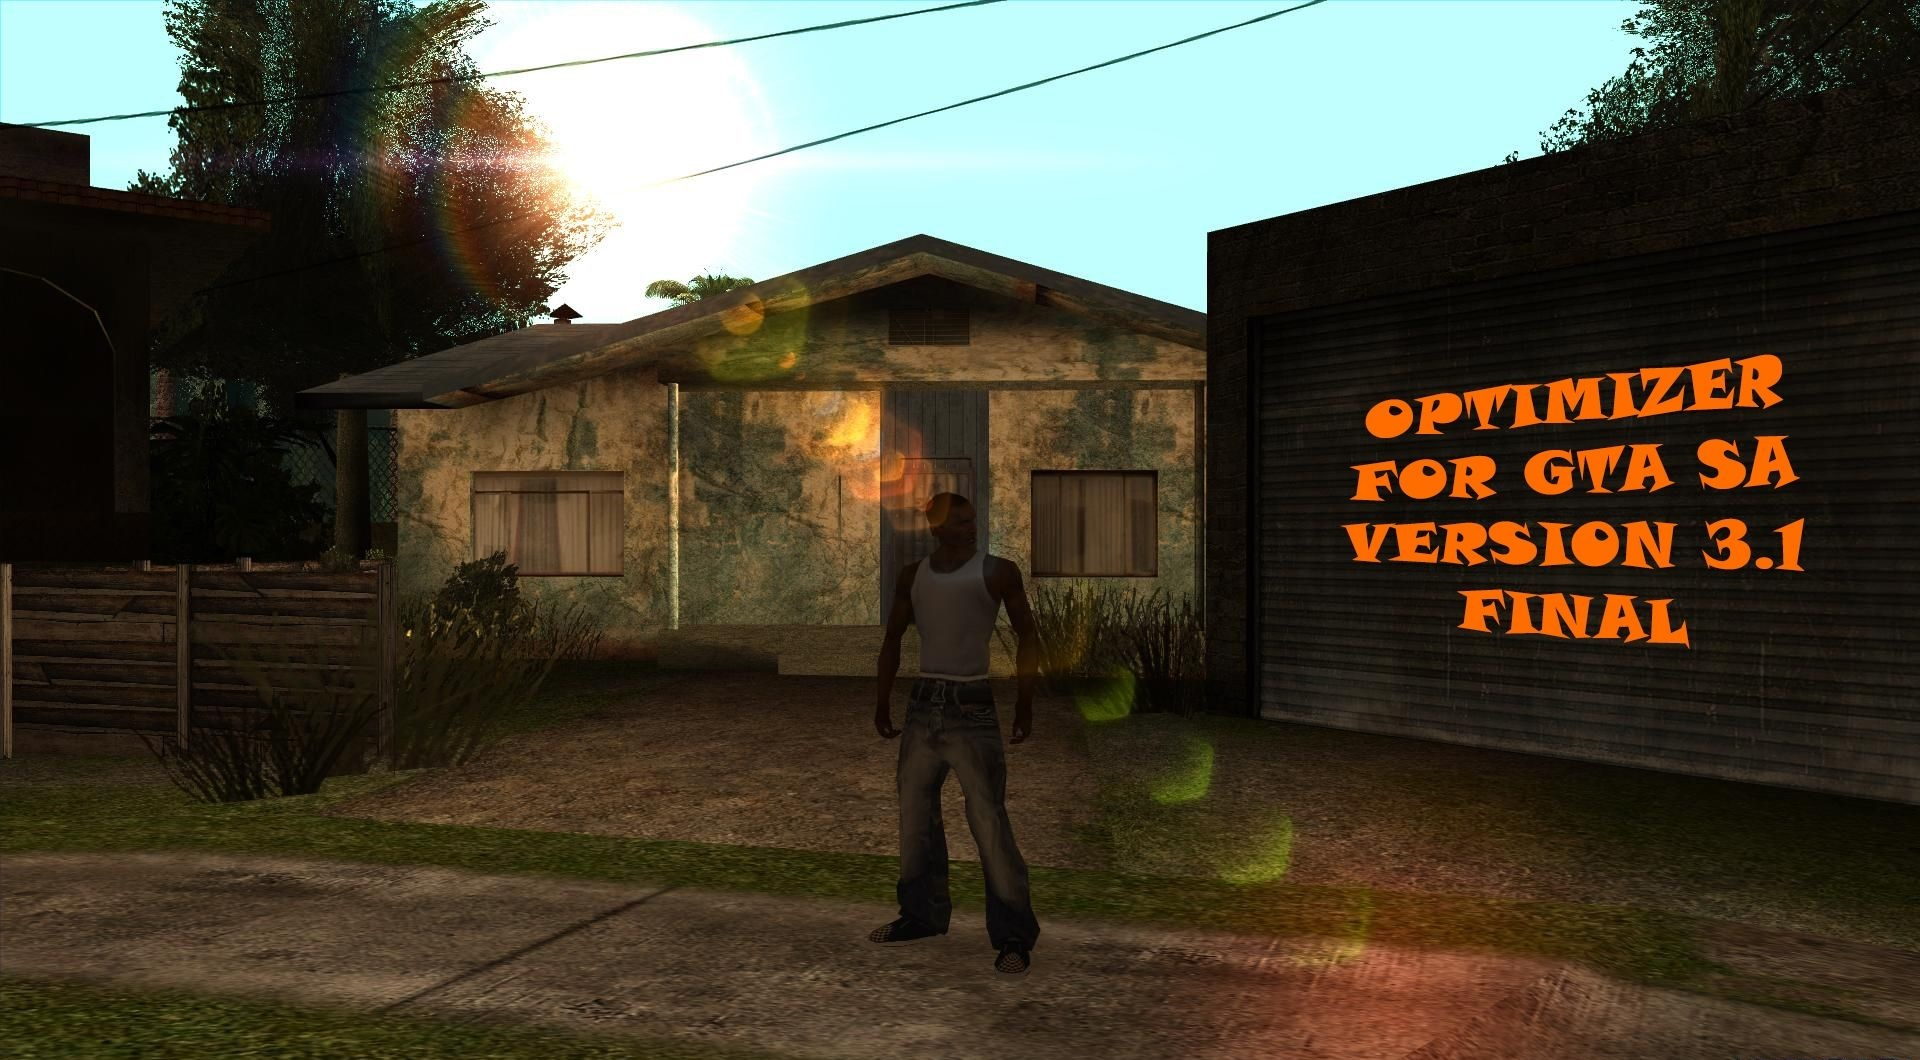 Optimizer for GTA SA v3.1 FINAL